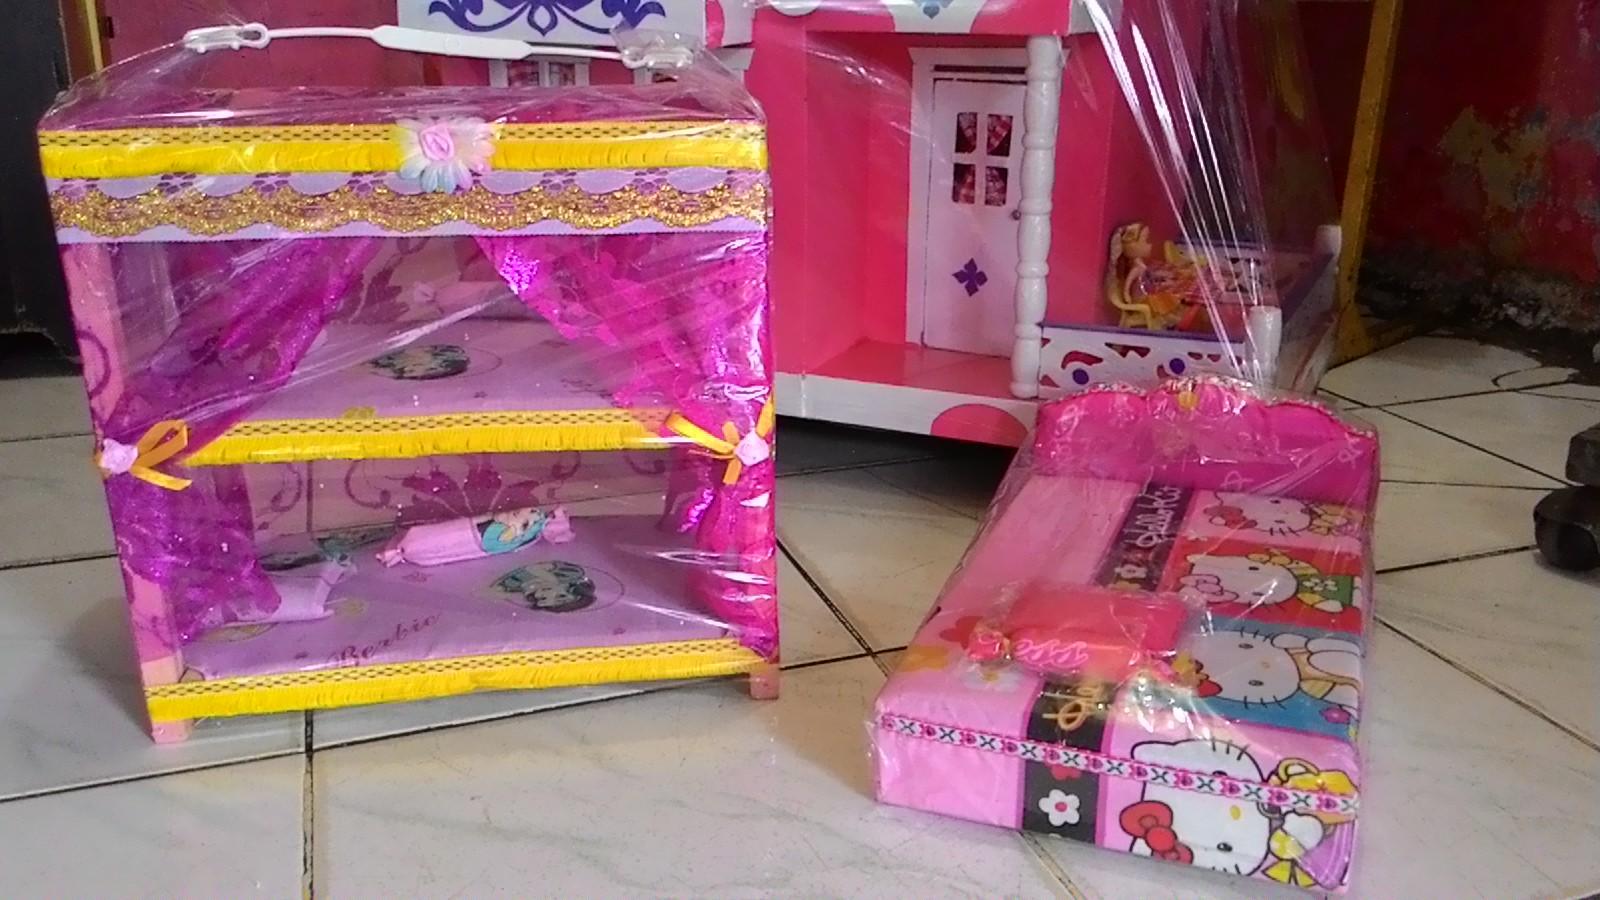 Jual Tempat Tidur Mainan Barbie - Rumah Barbie Jakarta  2cb007812f